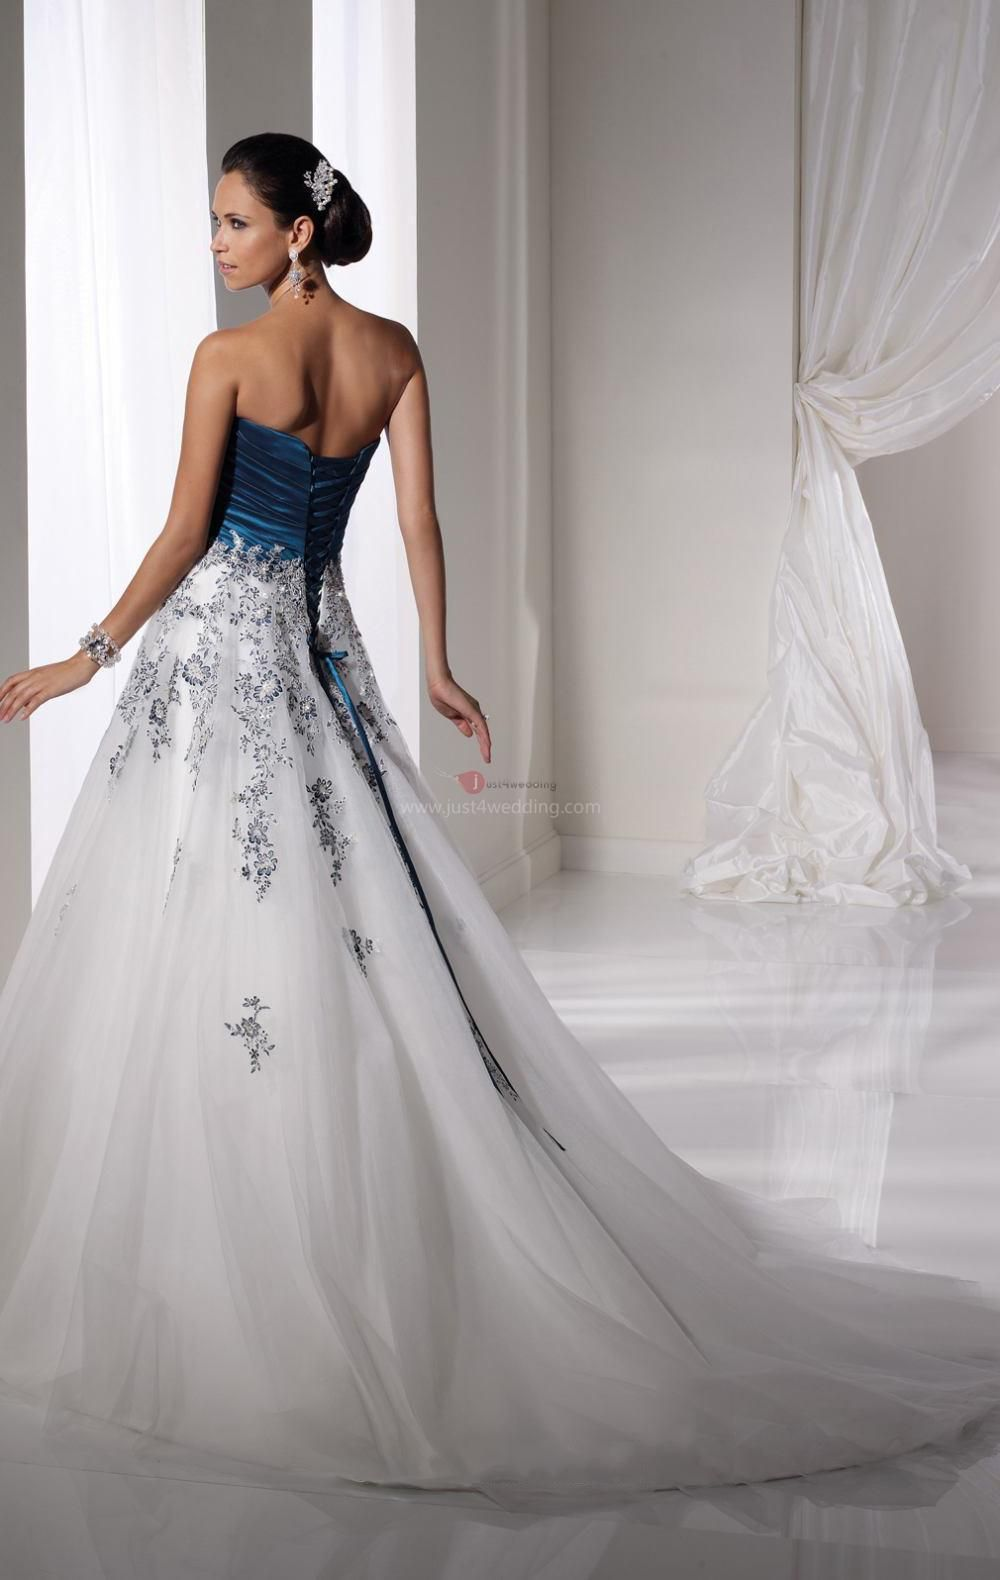 Tall White And Blue Wedding Dress Blue Wedding Dresses